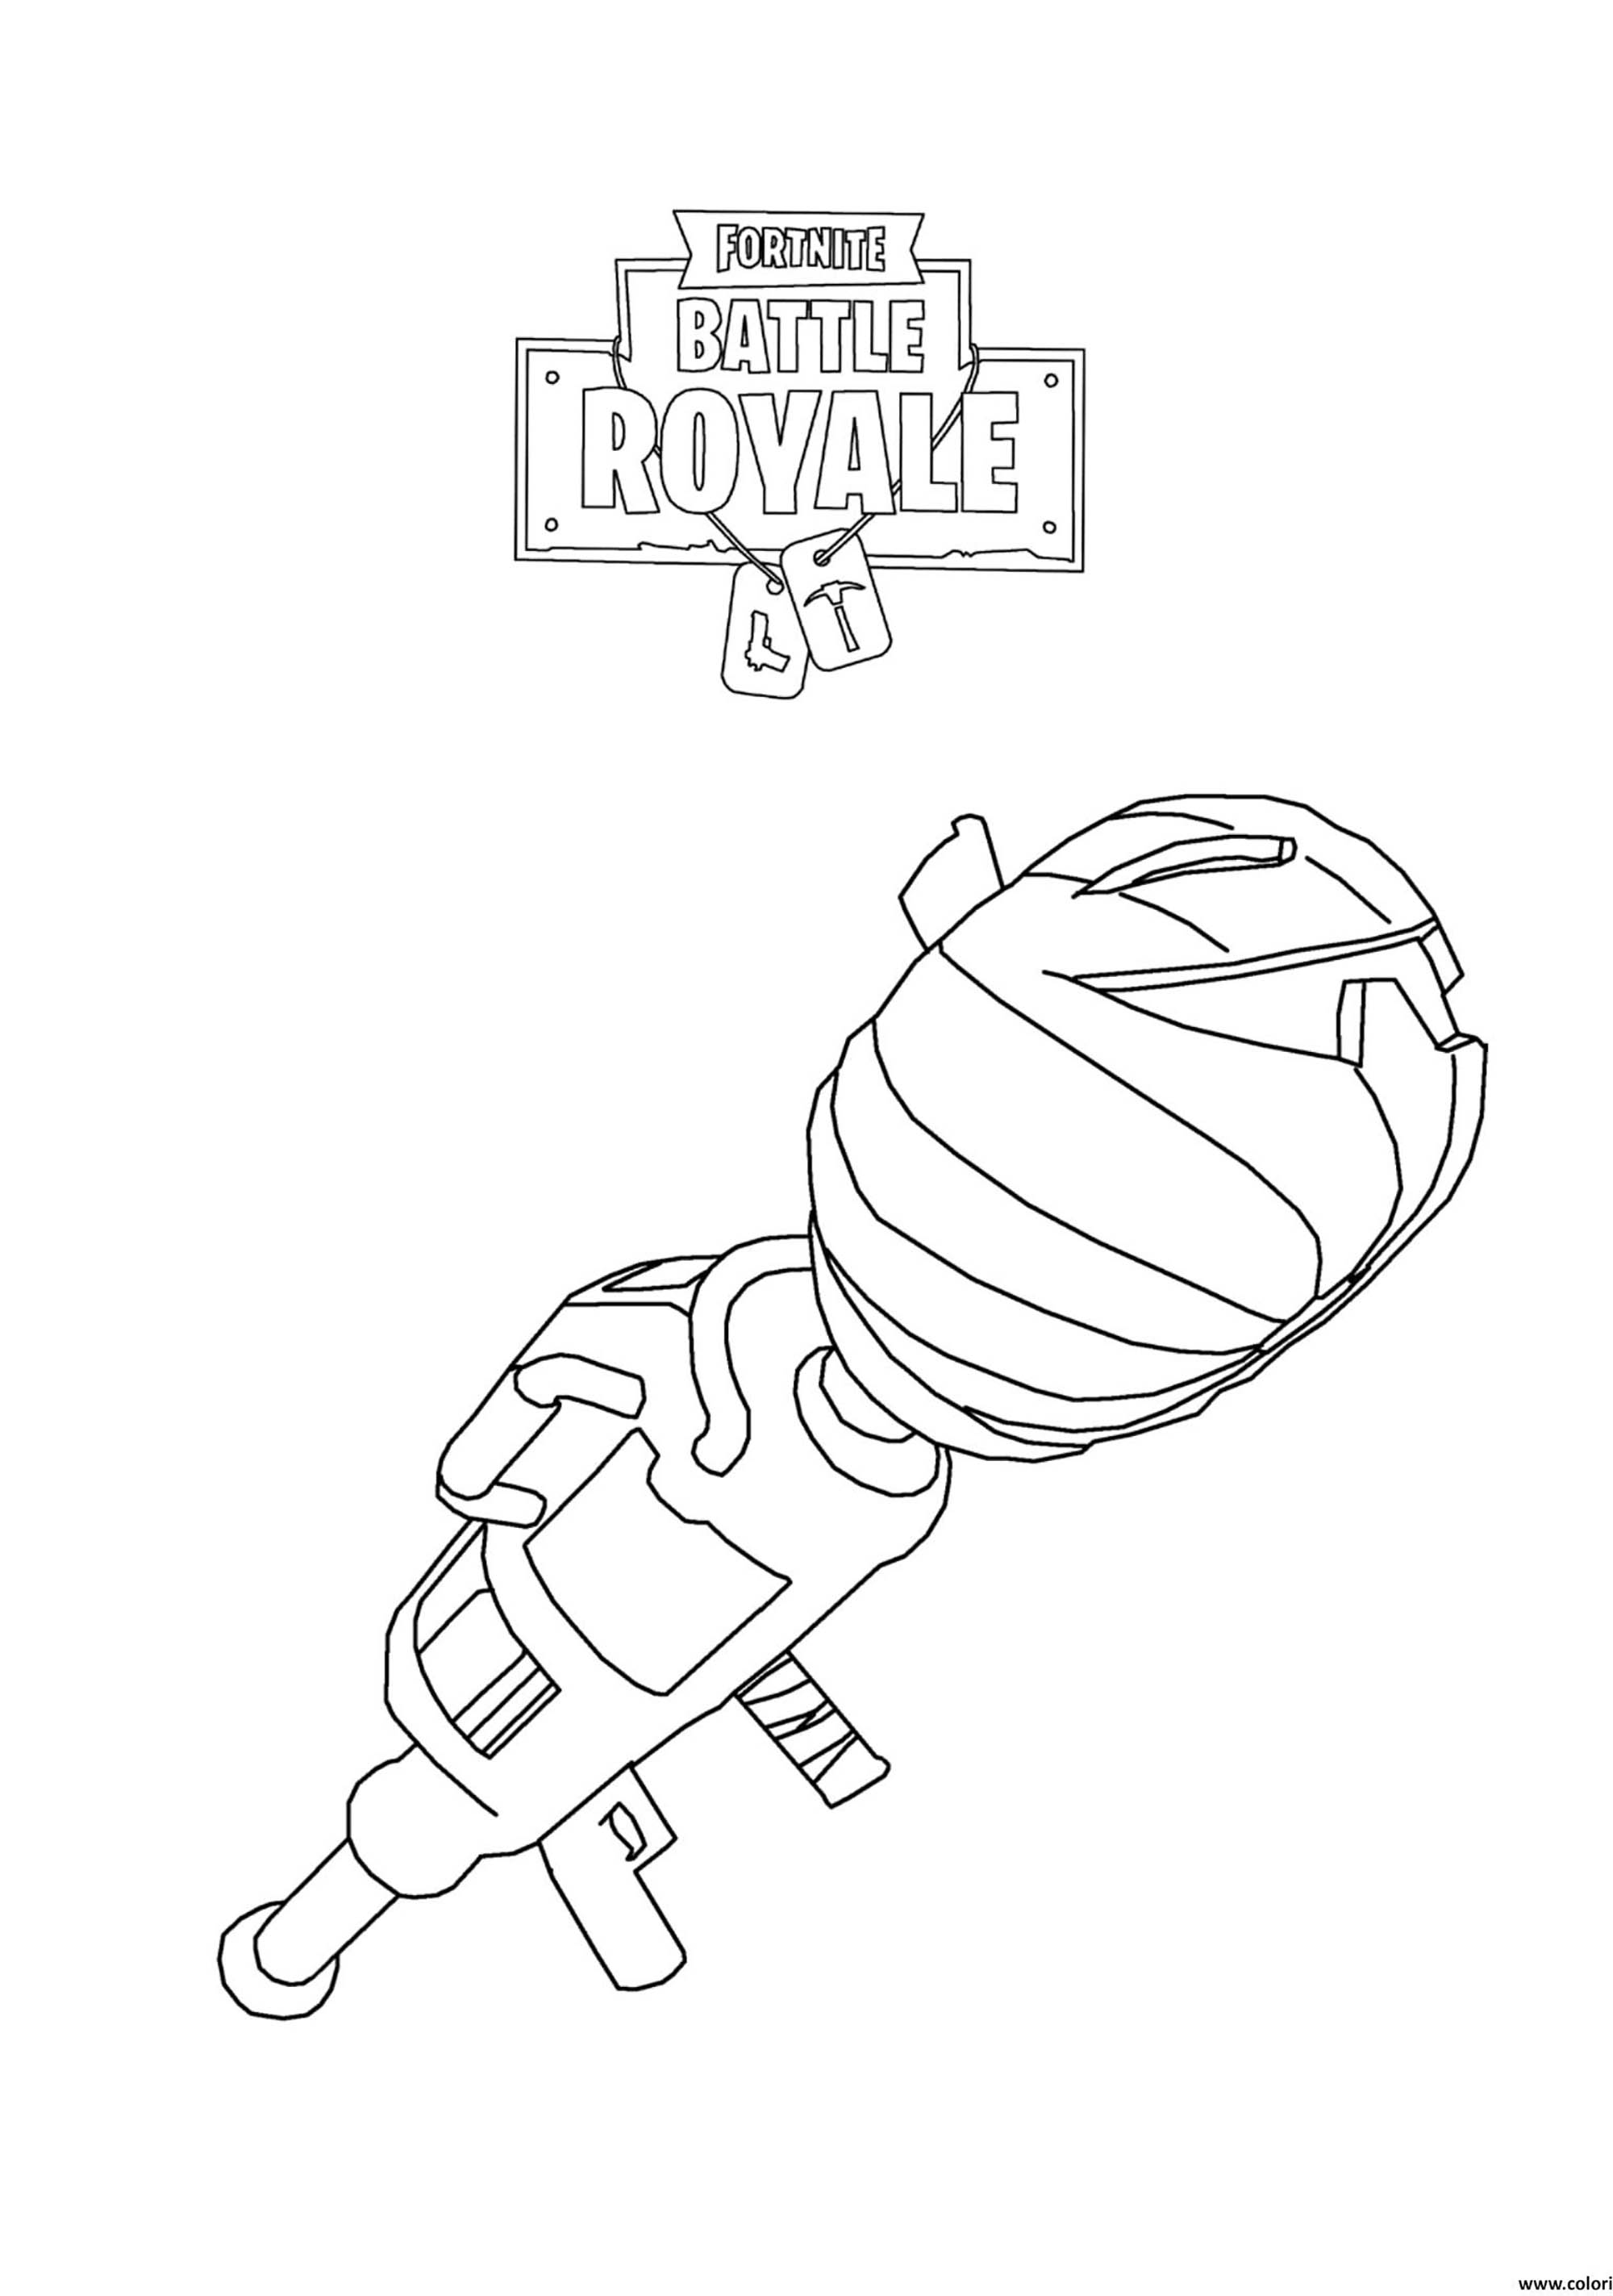 Fortnite Battle Royale Rocket Launcher Fortnite Battle